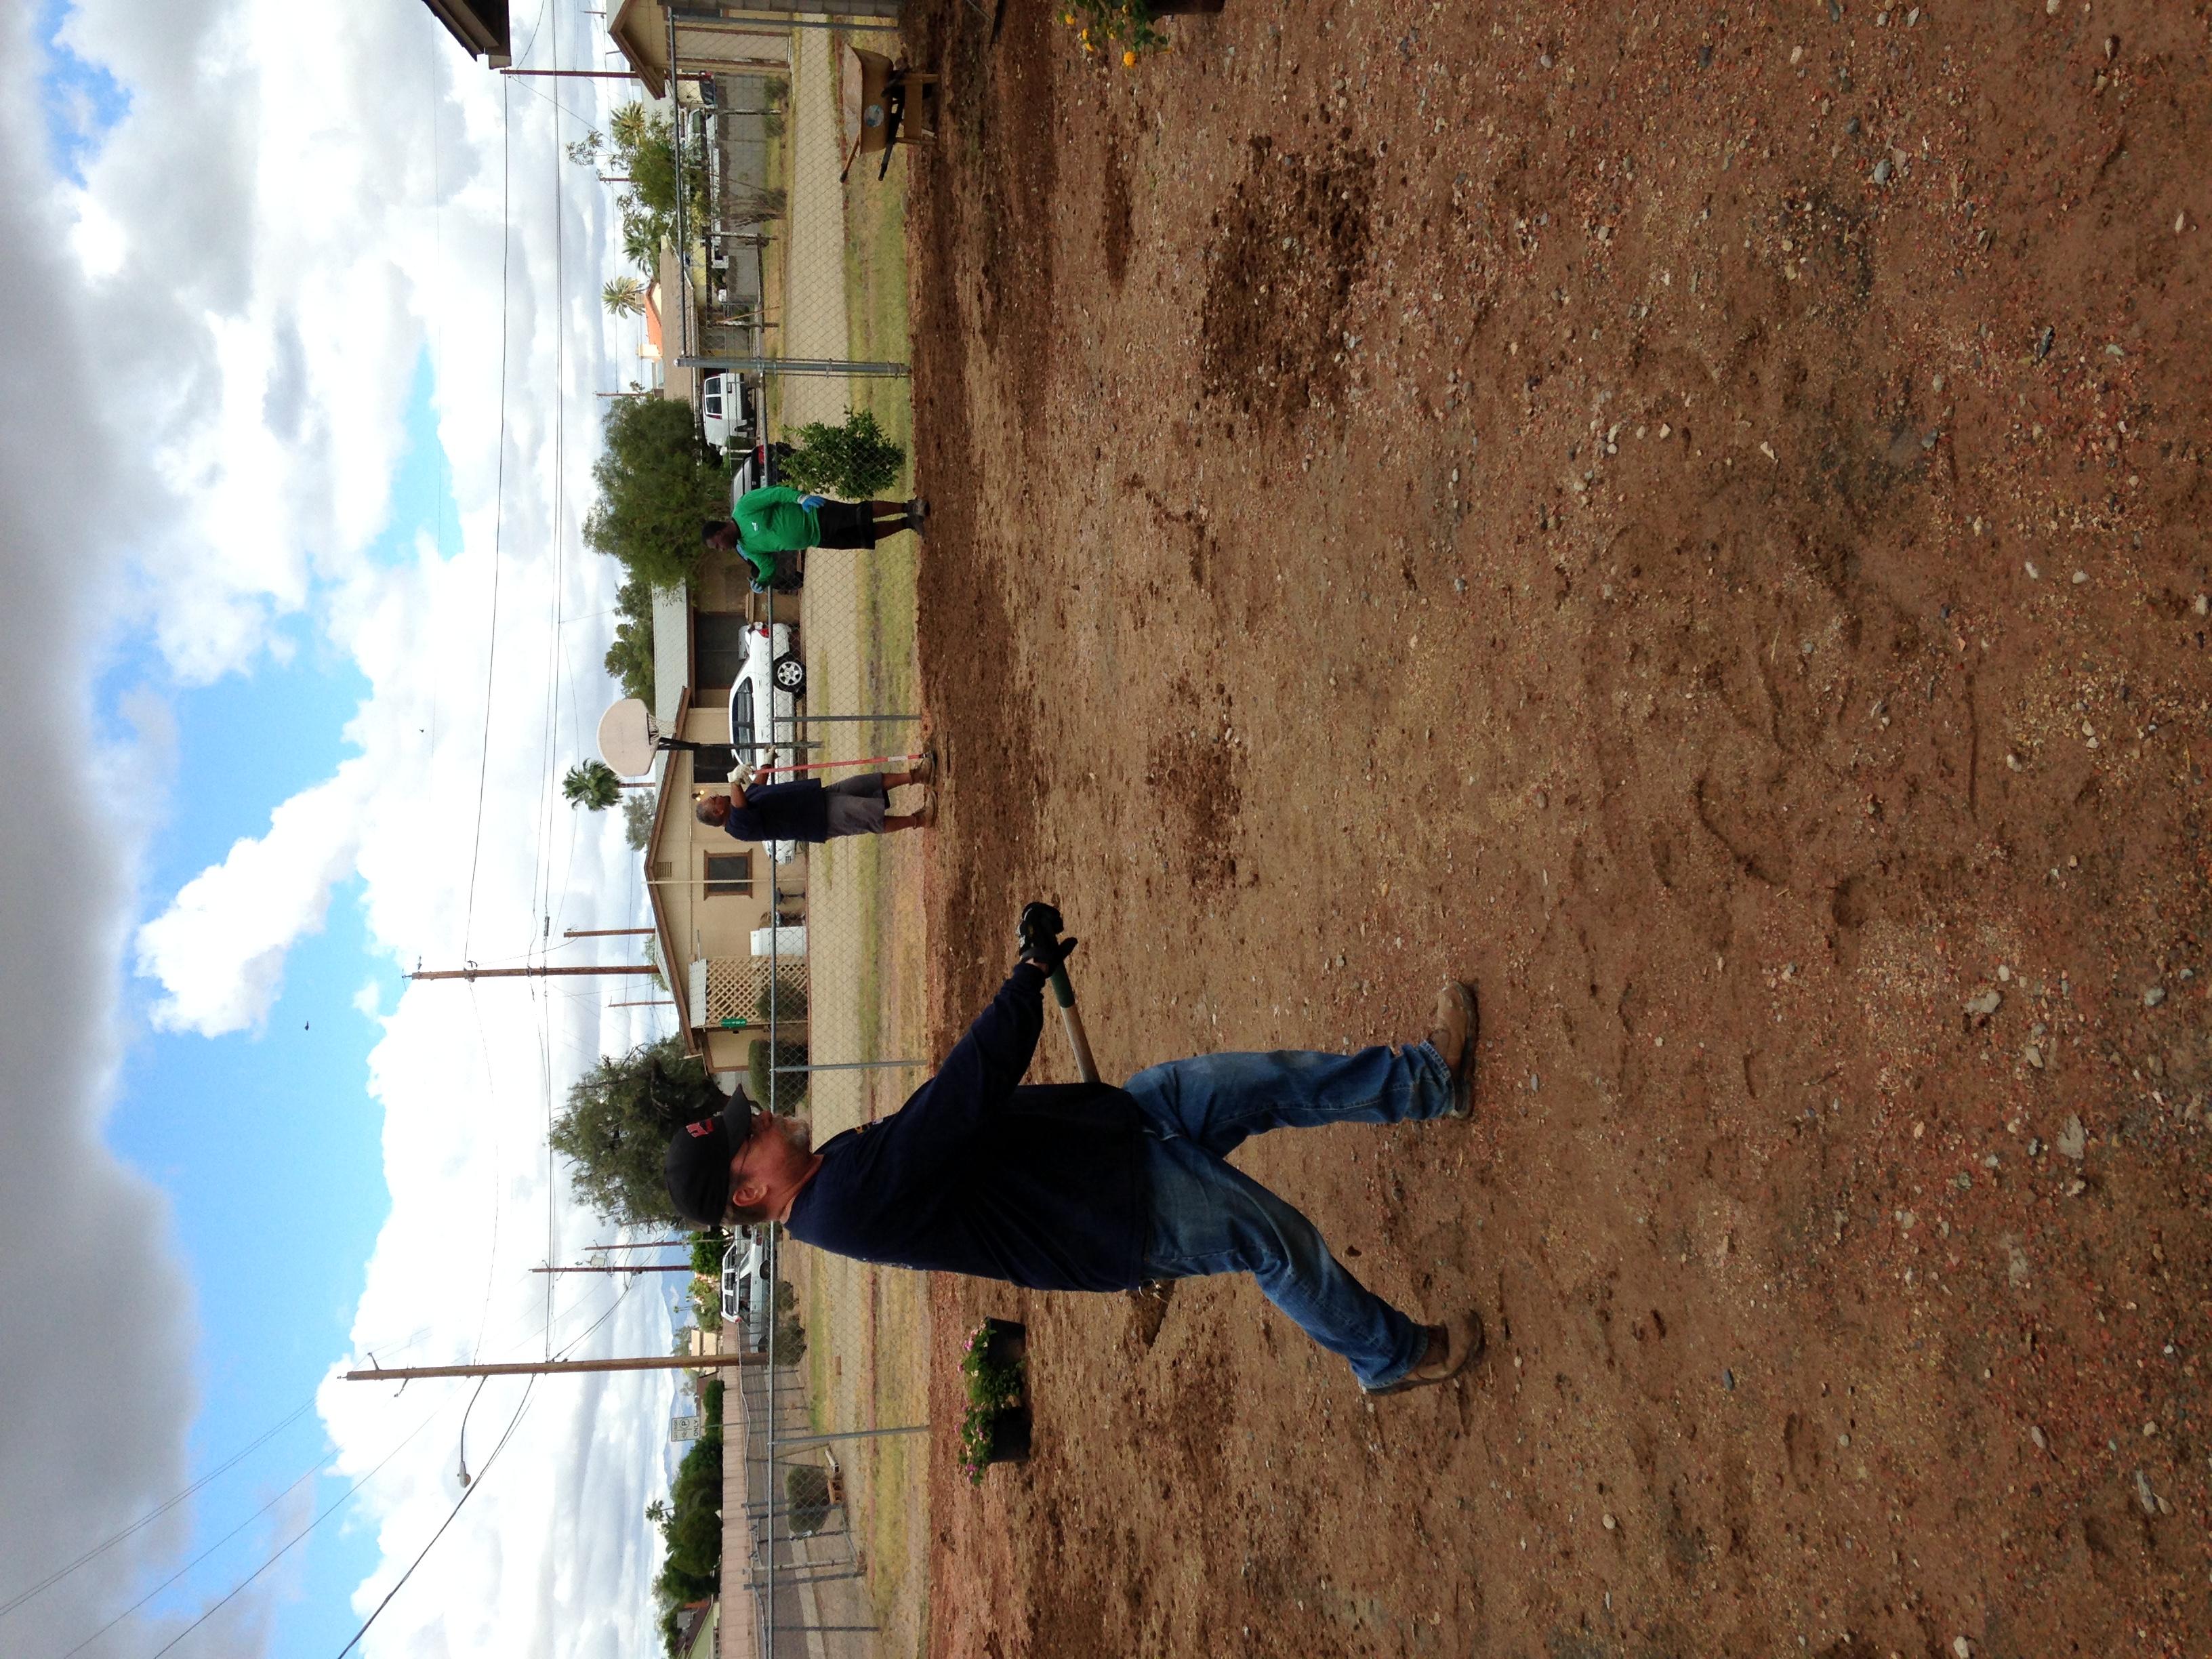 05.16.15_05 Yard cleanup.jpg